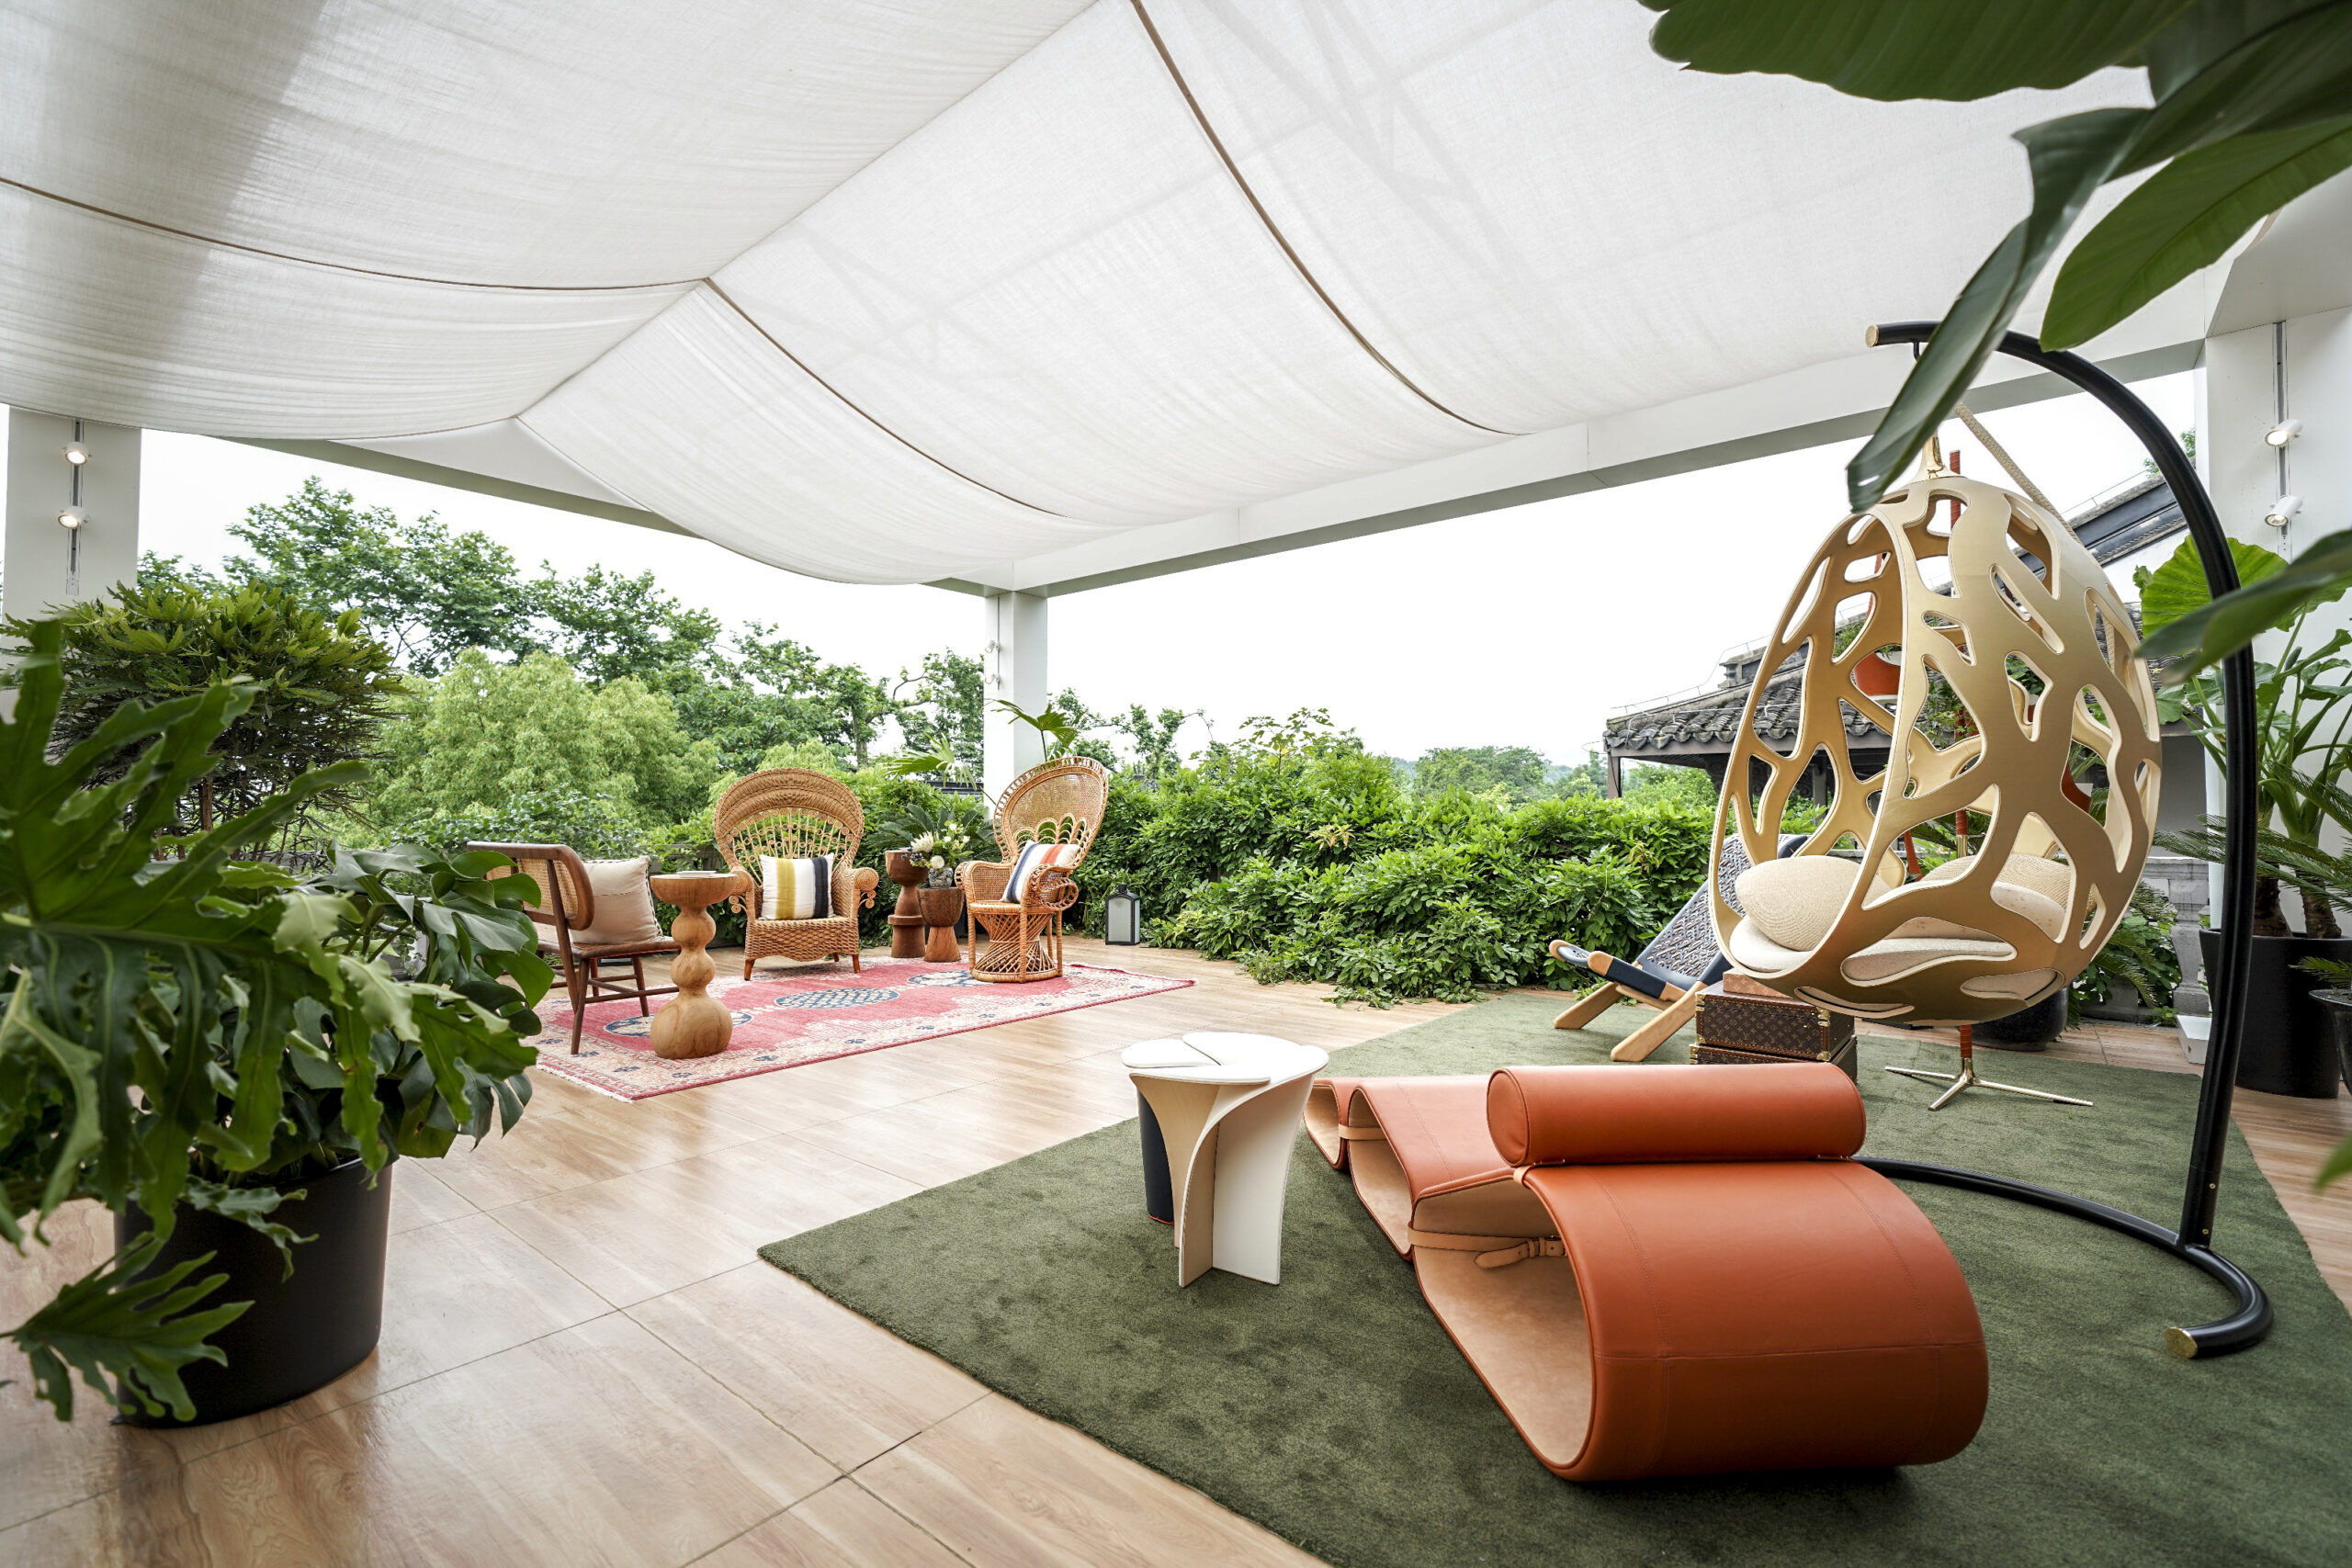 Louis Vuitton Hardsided Event Hangzhou May 28th – Jun 1st 2020 – 2